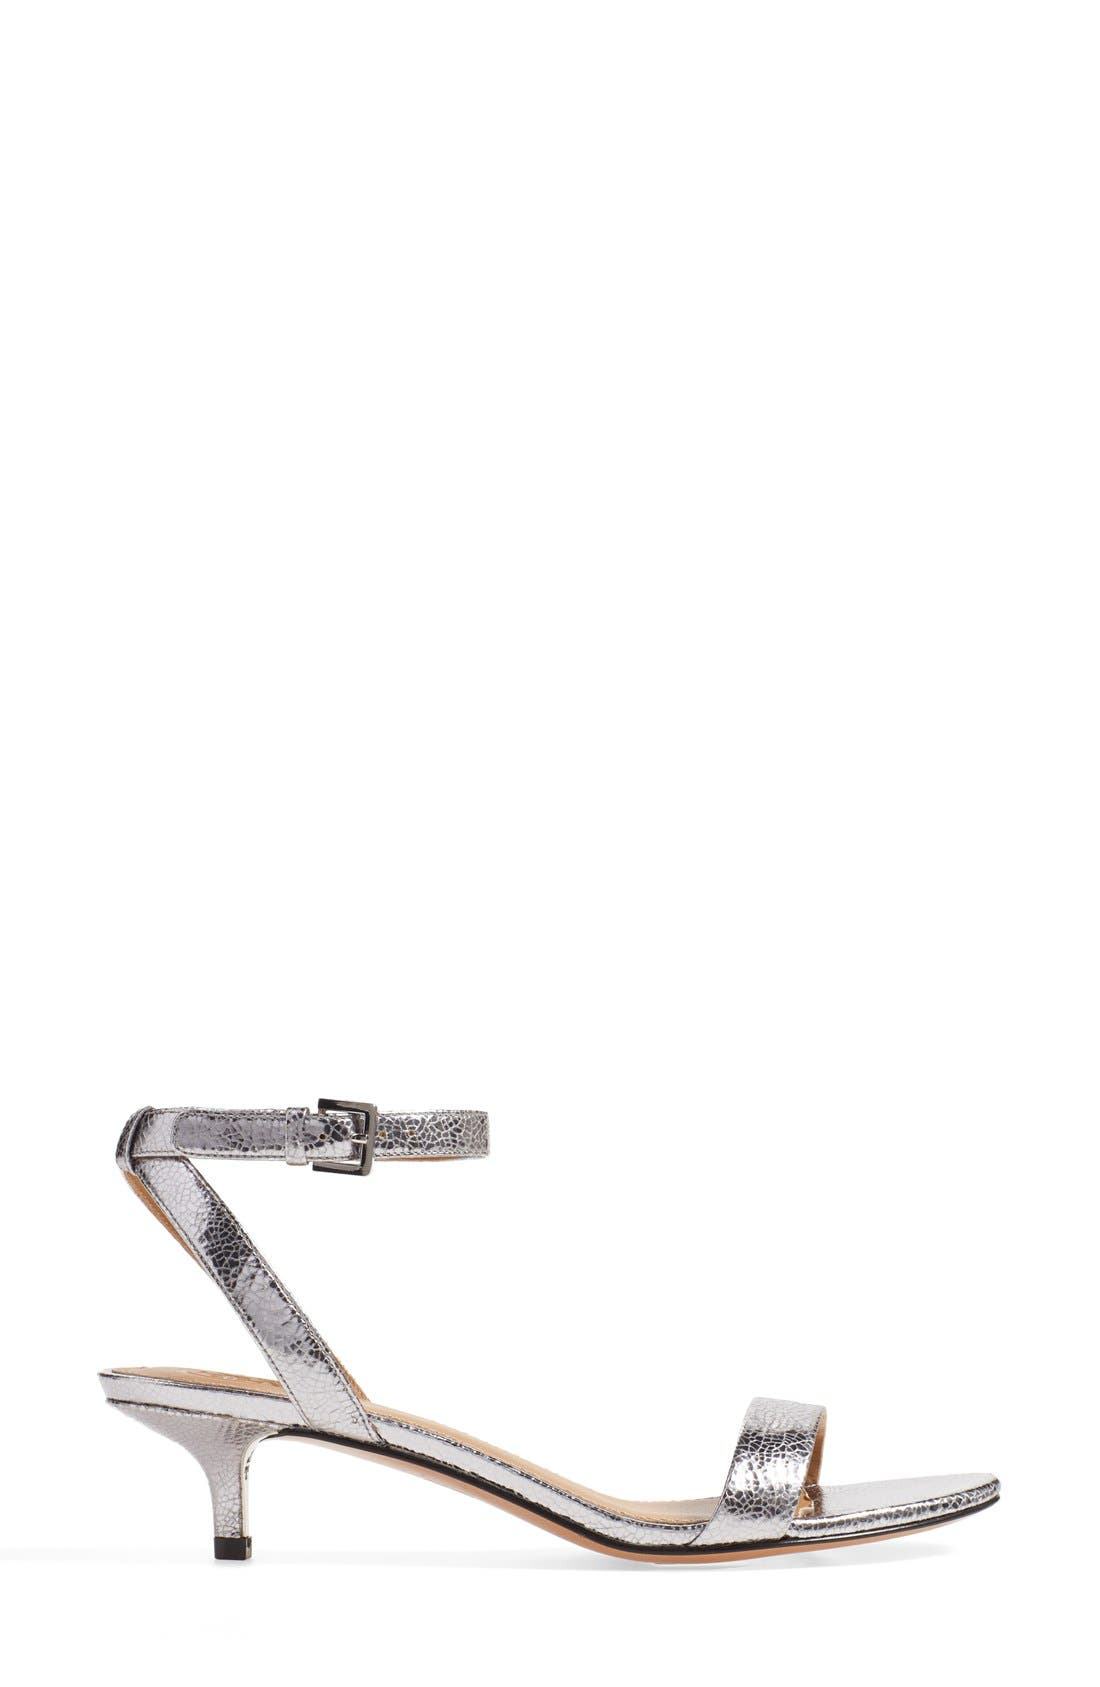 'Elana' Ankle Strap Sandal,                             Alternate thumbnail 3, color,                             043